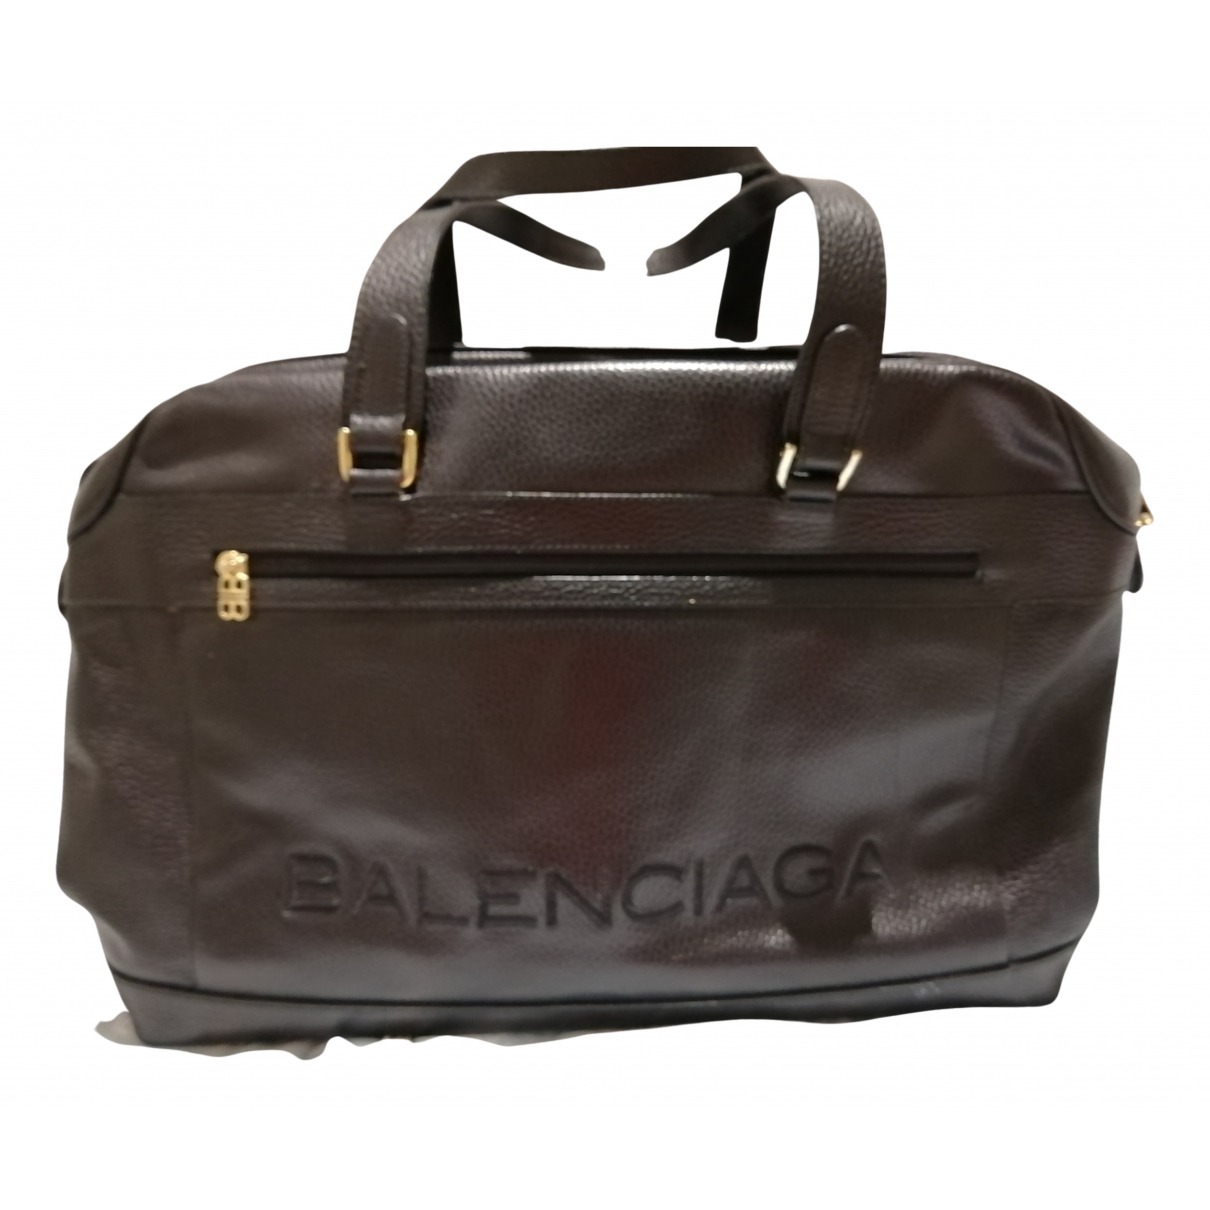 Balenciaga N Black Leather Travel bag for Women N